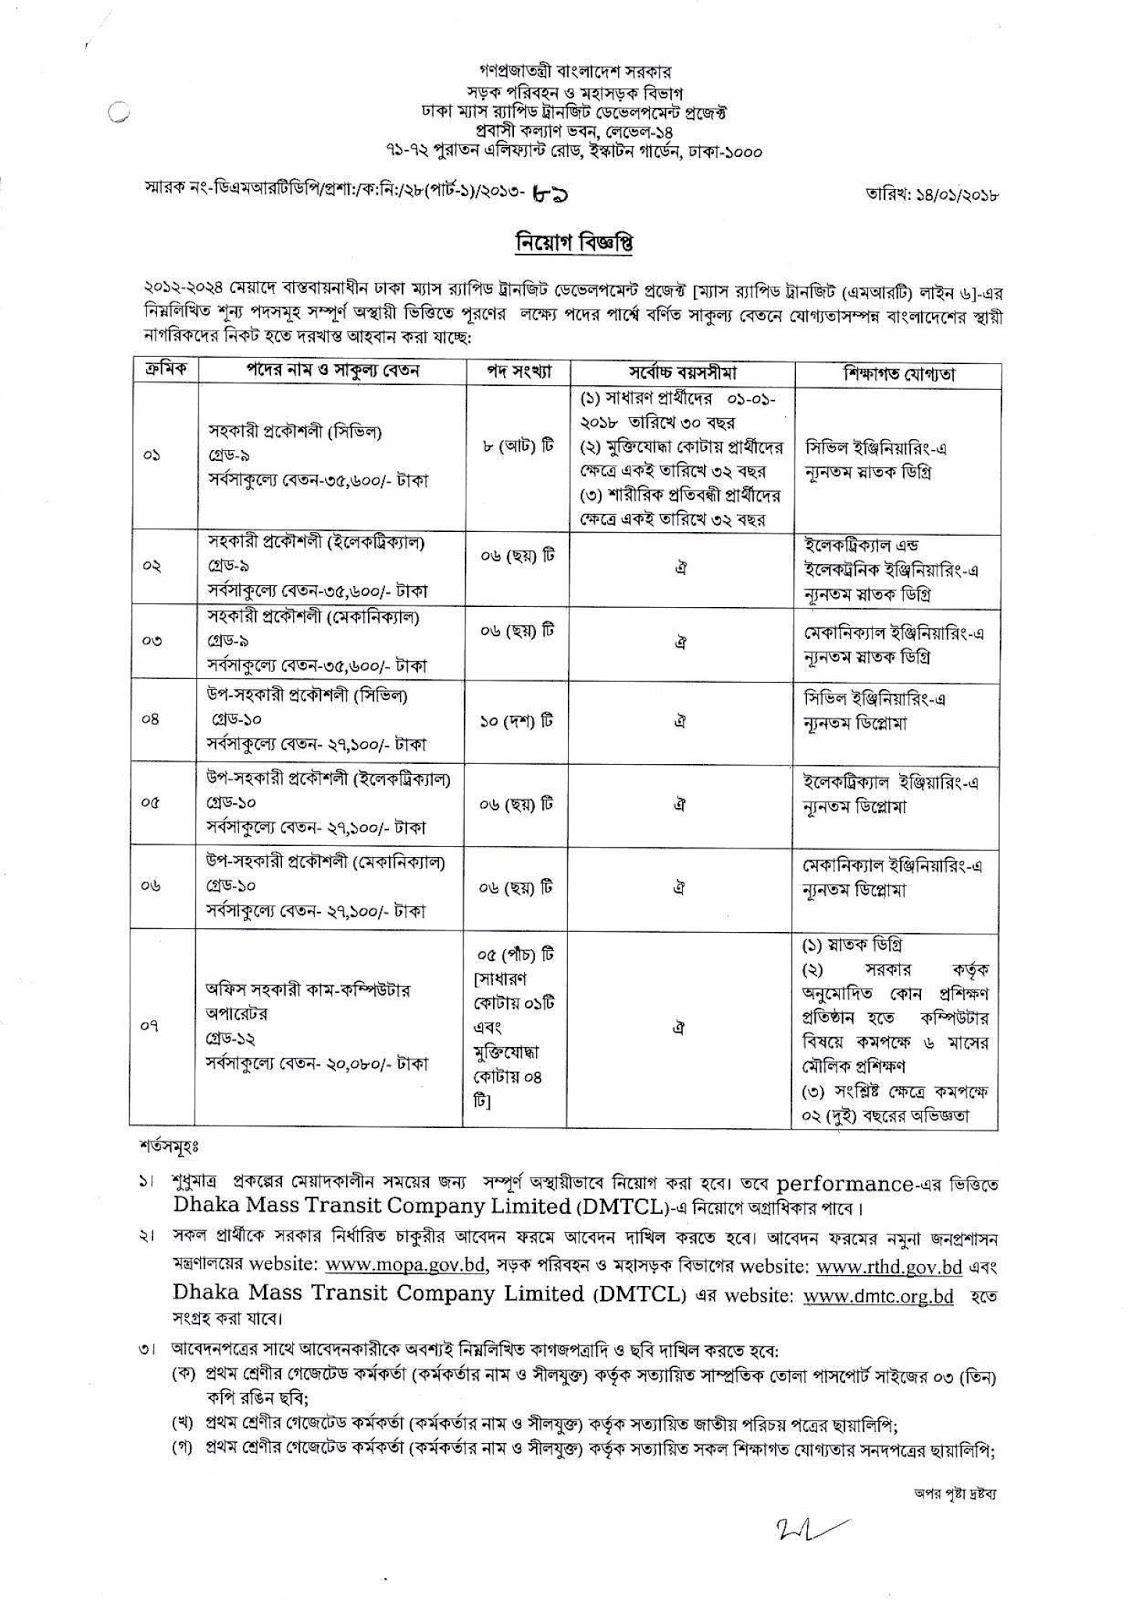 DMTCL - Dhaka Mass Transit Company Limited job circular 2018